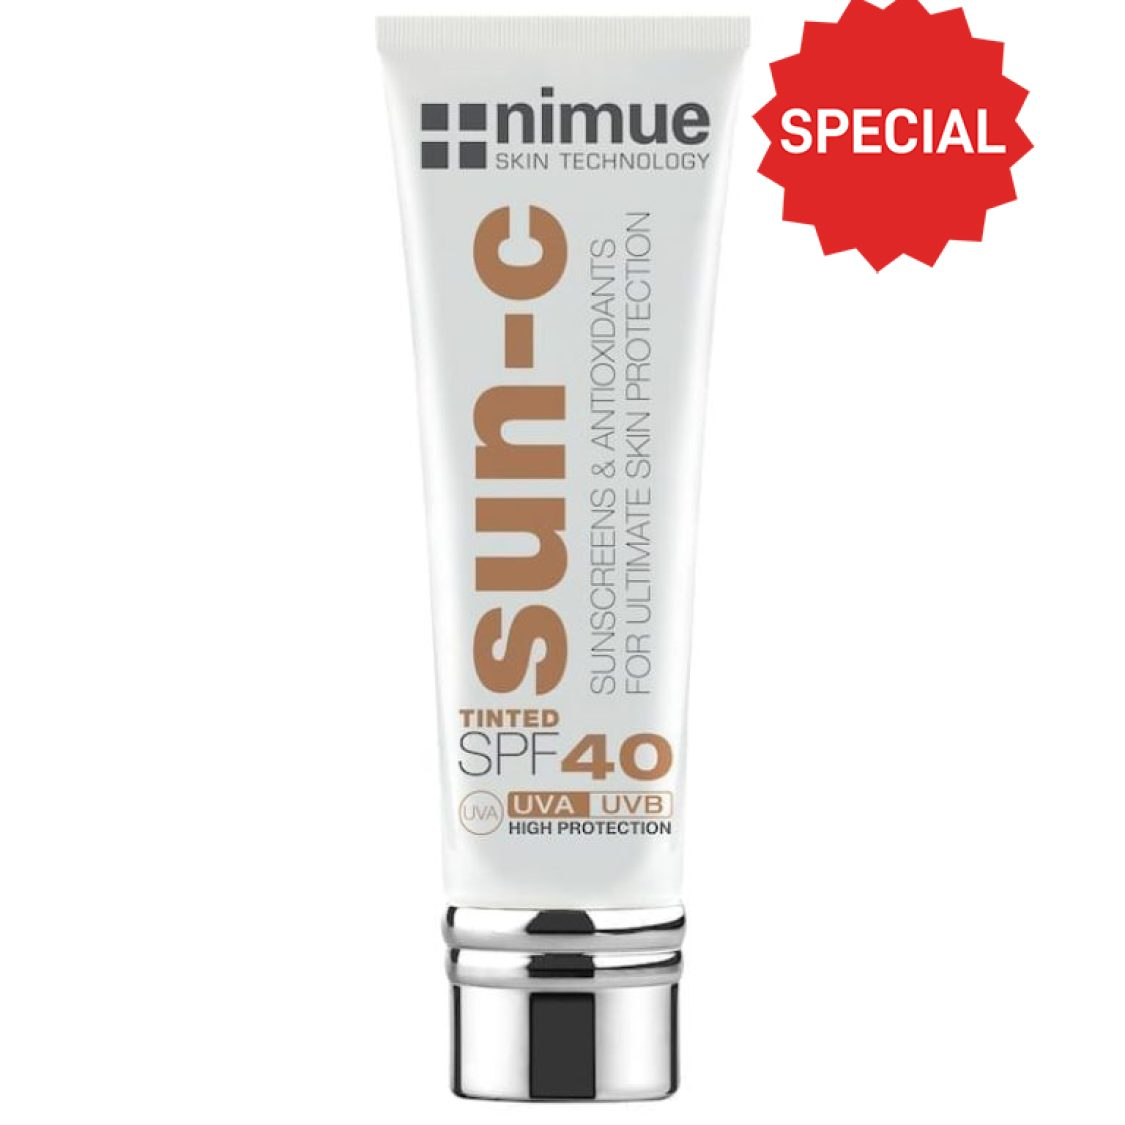 Nimue -  Sun-C Tinted SPF 40 Dark 60ml